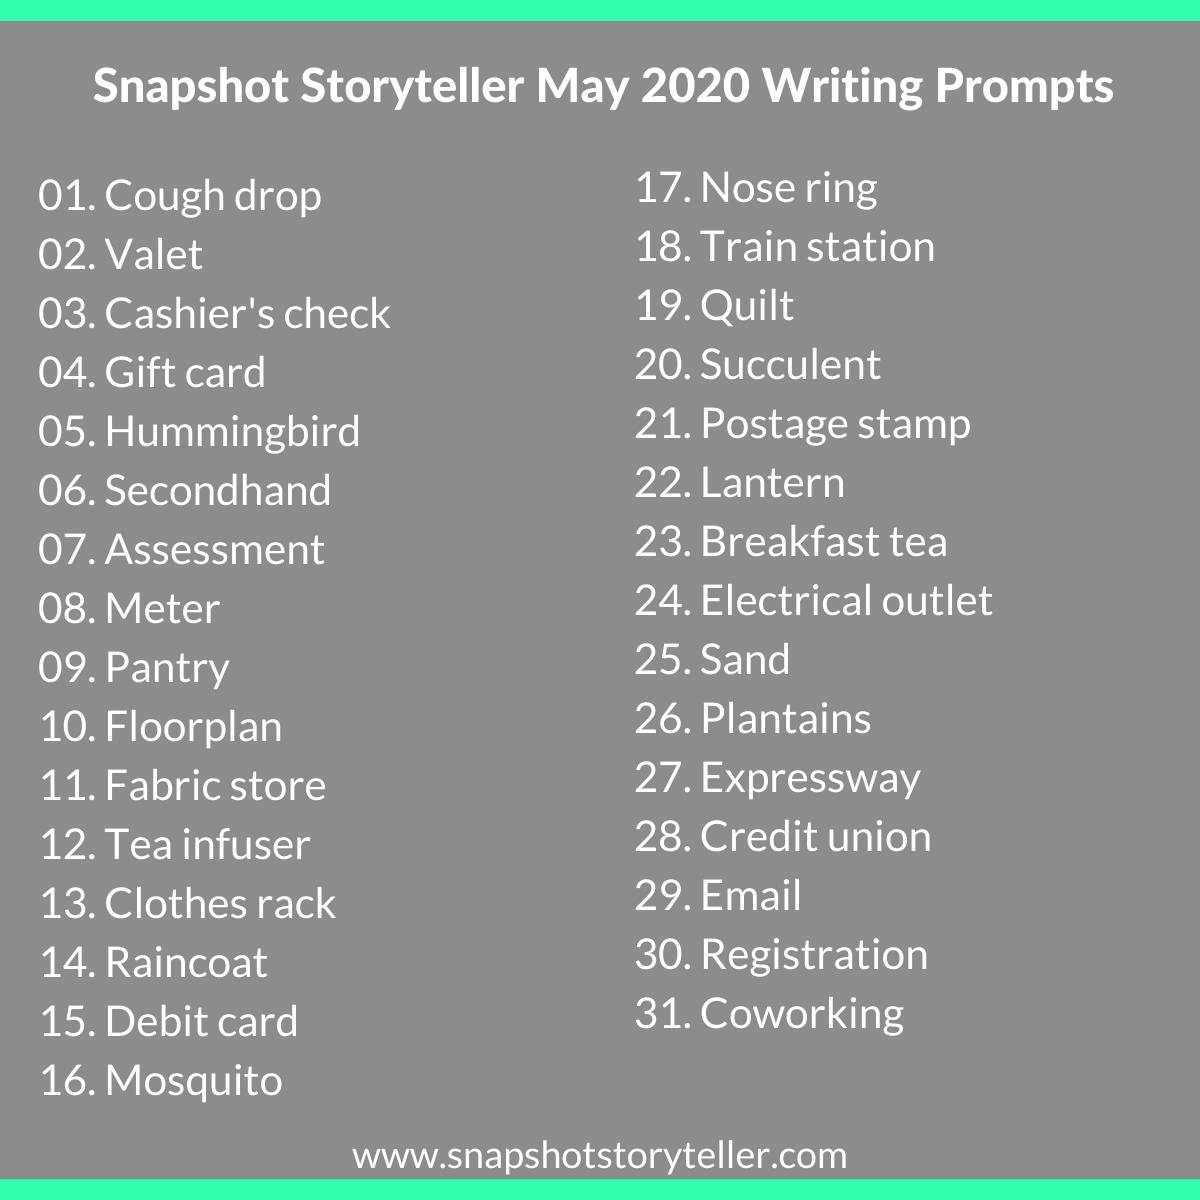 Snapshot Storyteller | May 2020 Writing Prompts | www.snapshotstoryteller.com | #amwriting #SnapshotStoryteller #creativestoryteller #creative #storyteller #creativewriter #IWrite #WriteOn #writersofinstagram#writingprompt #writingprompts